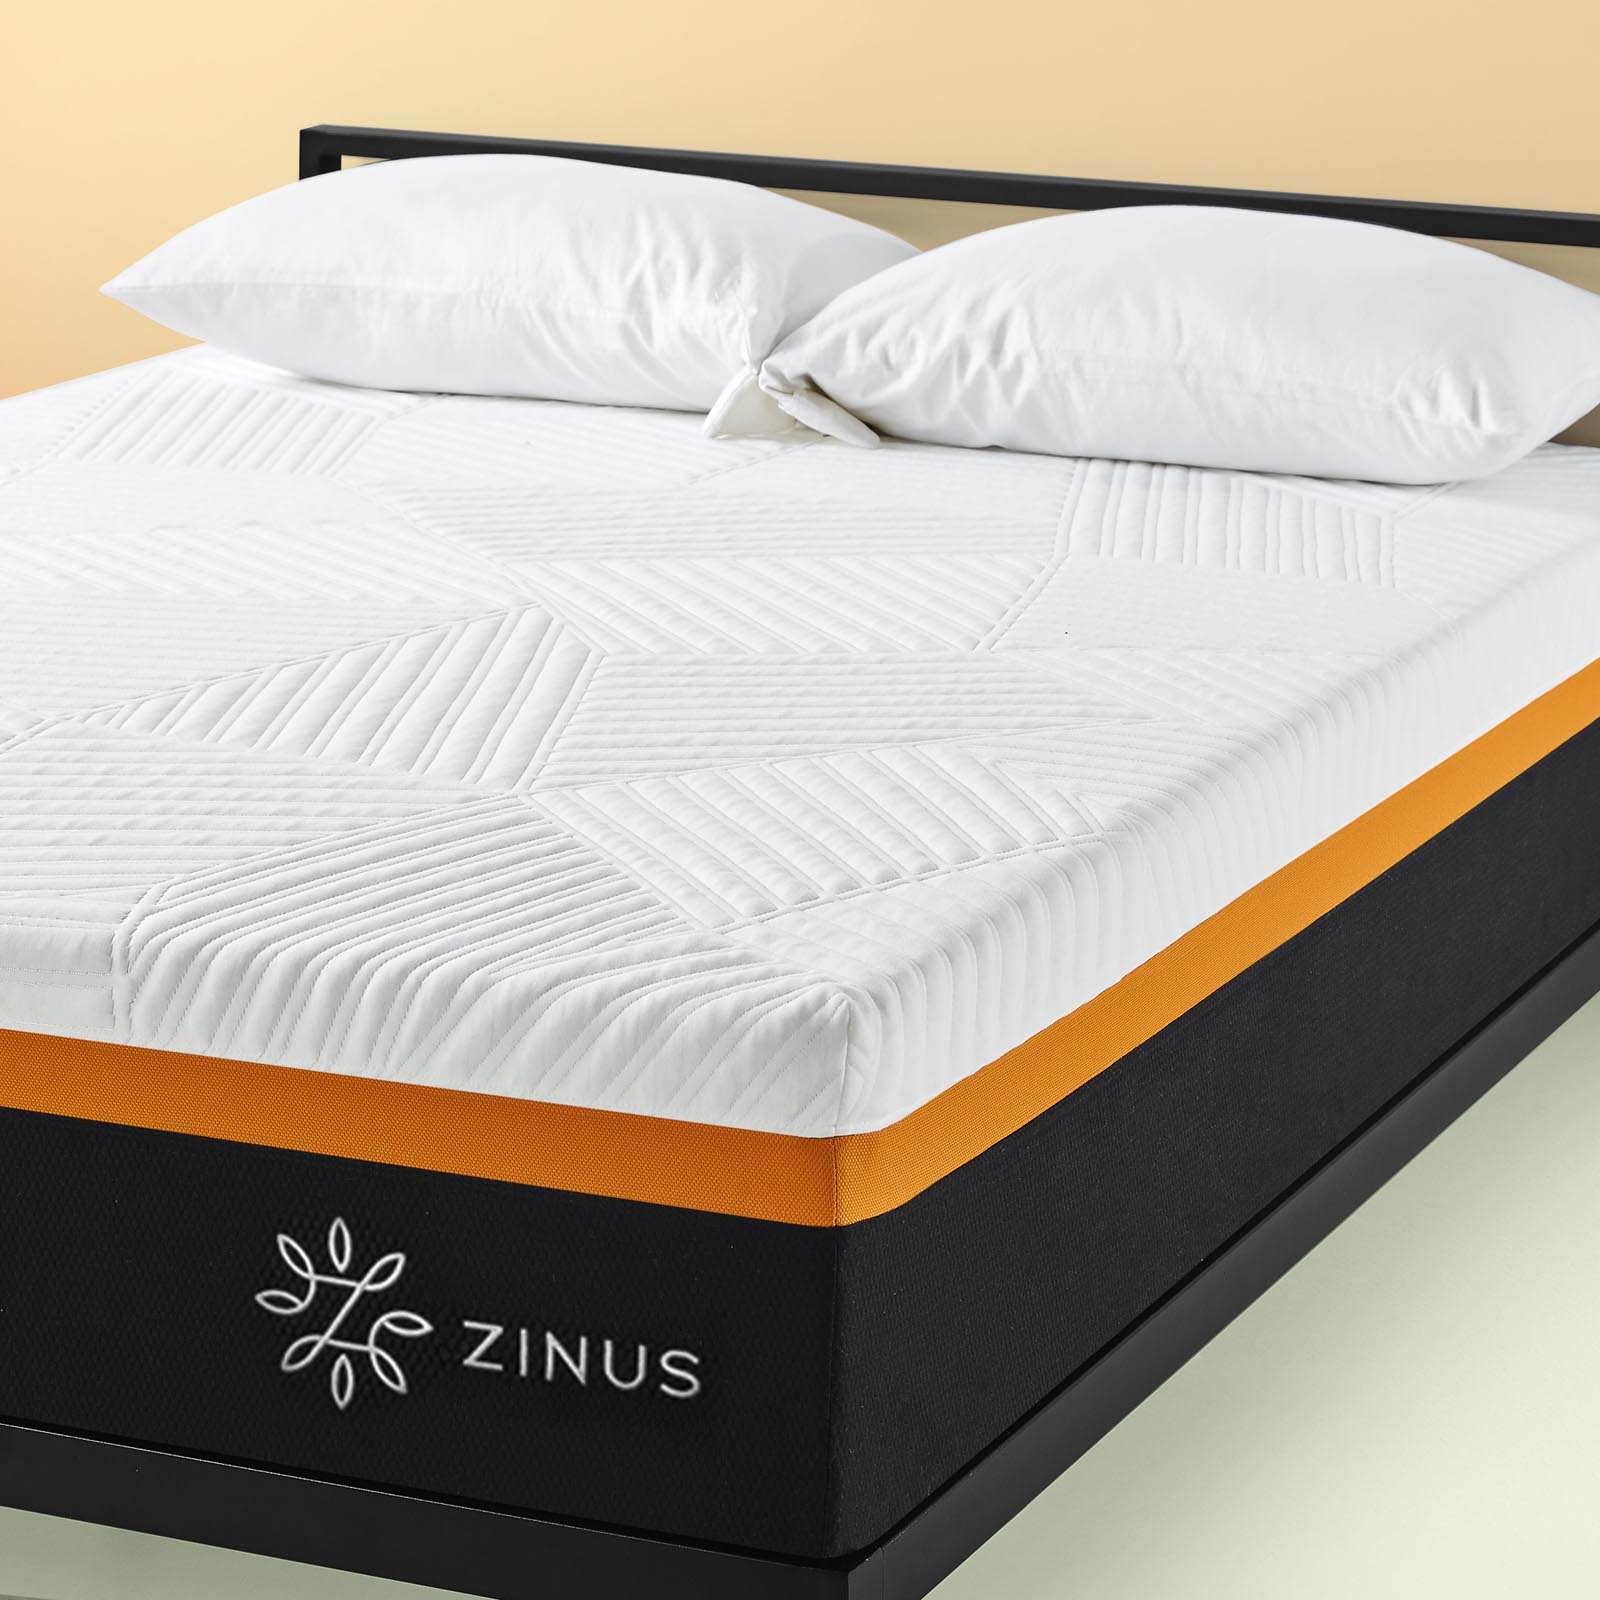 Zinus Mattress - Daniel